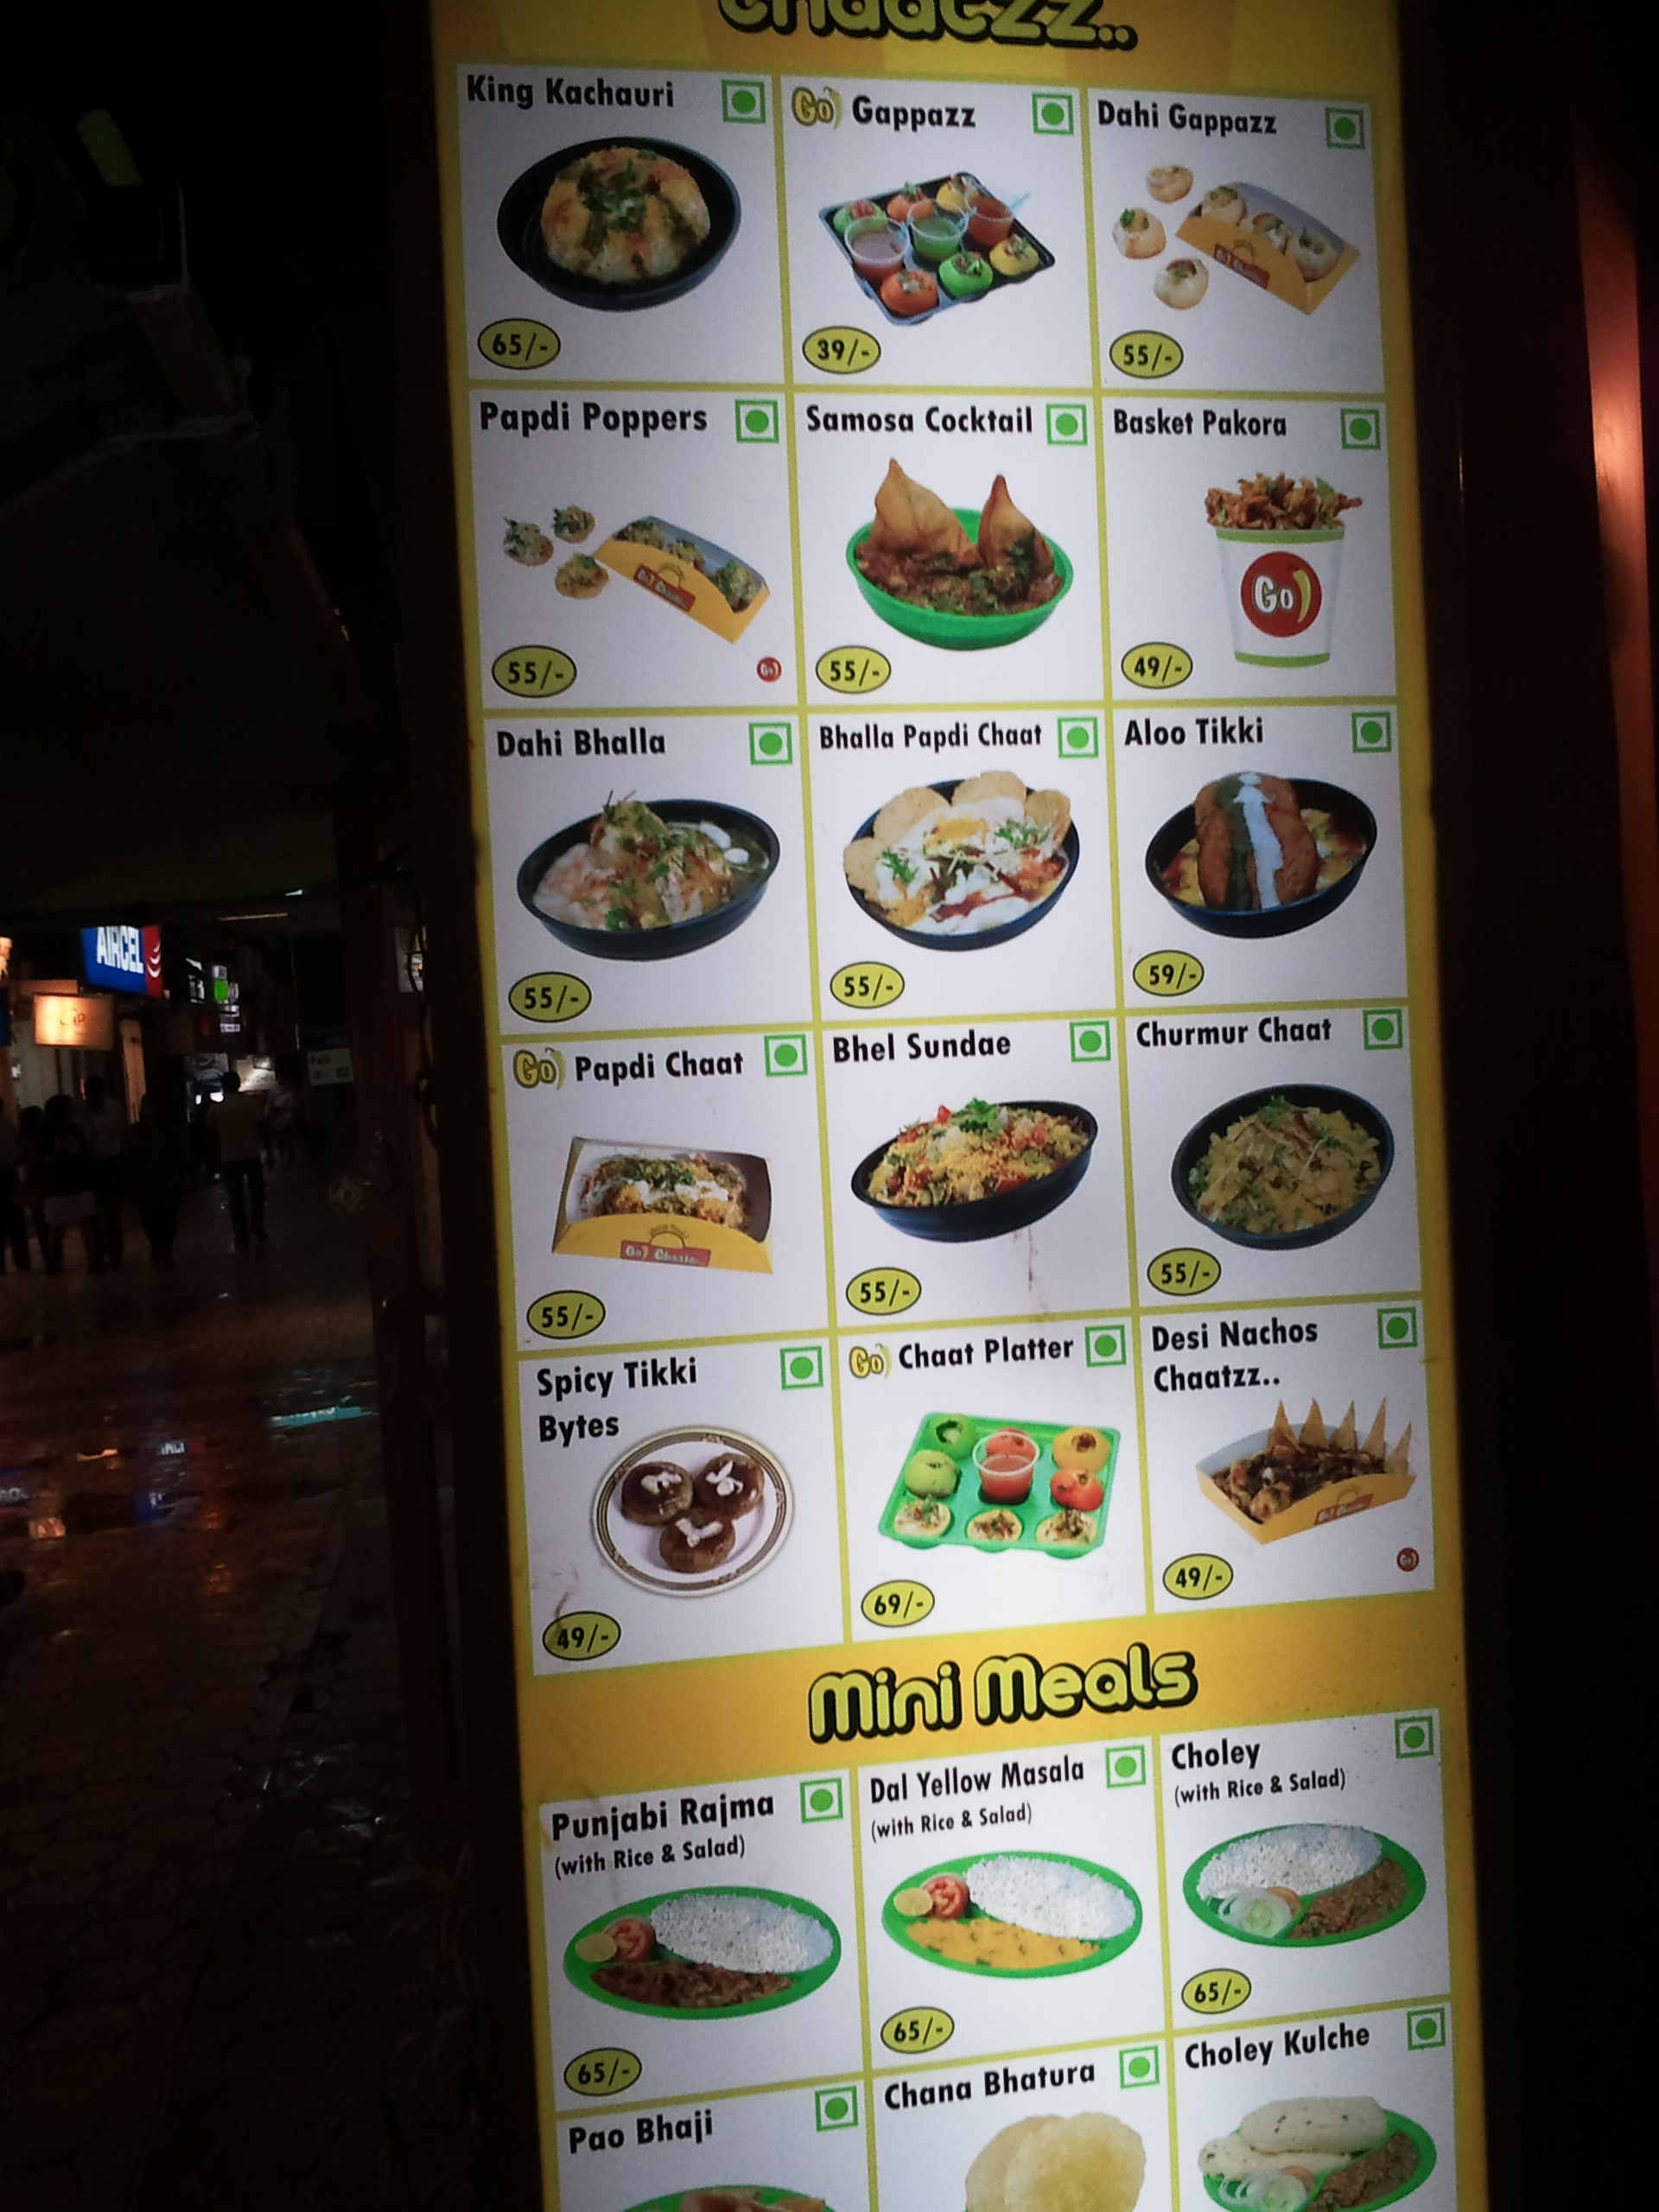 Go Chhatz – Chhat & North Indian Snacks stalls in many ...